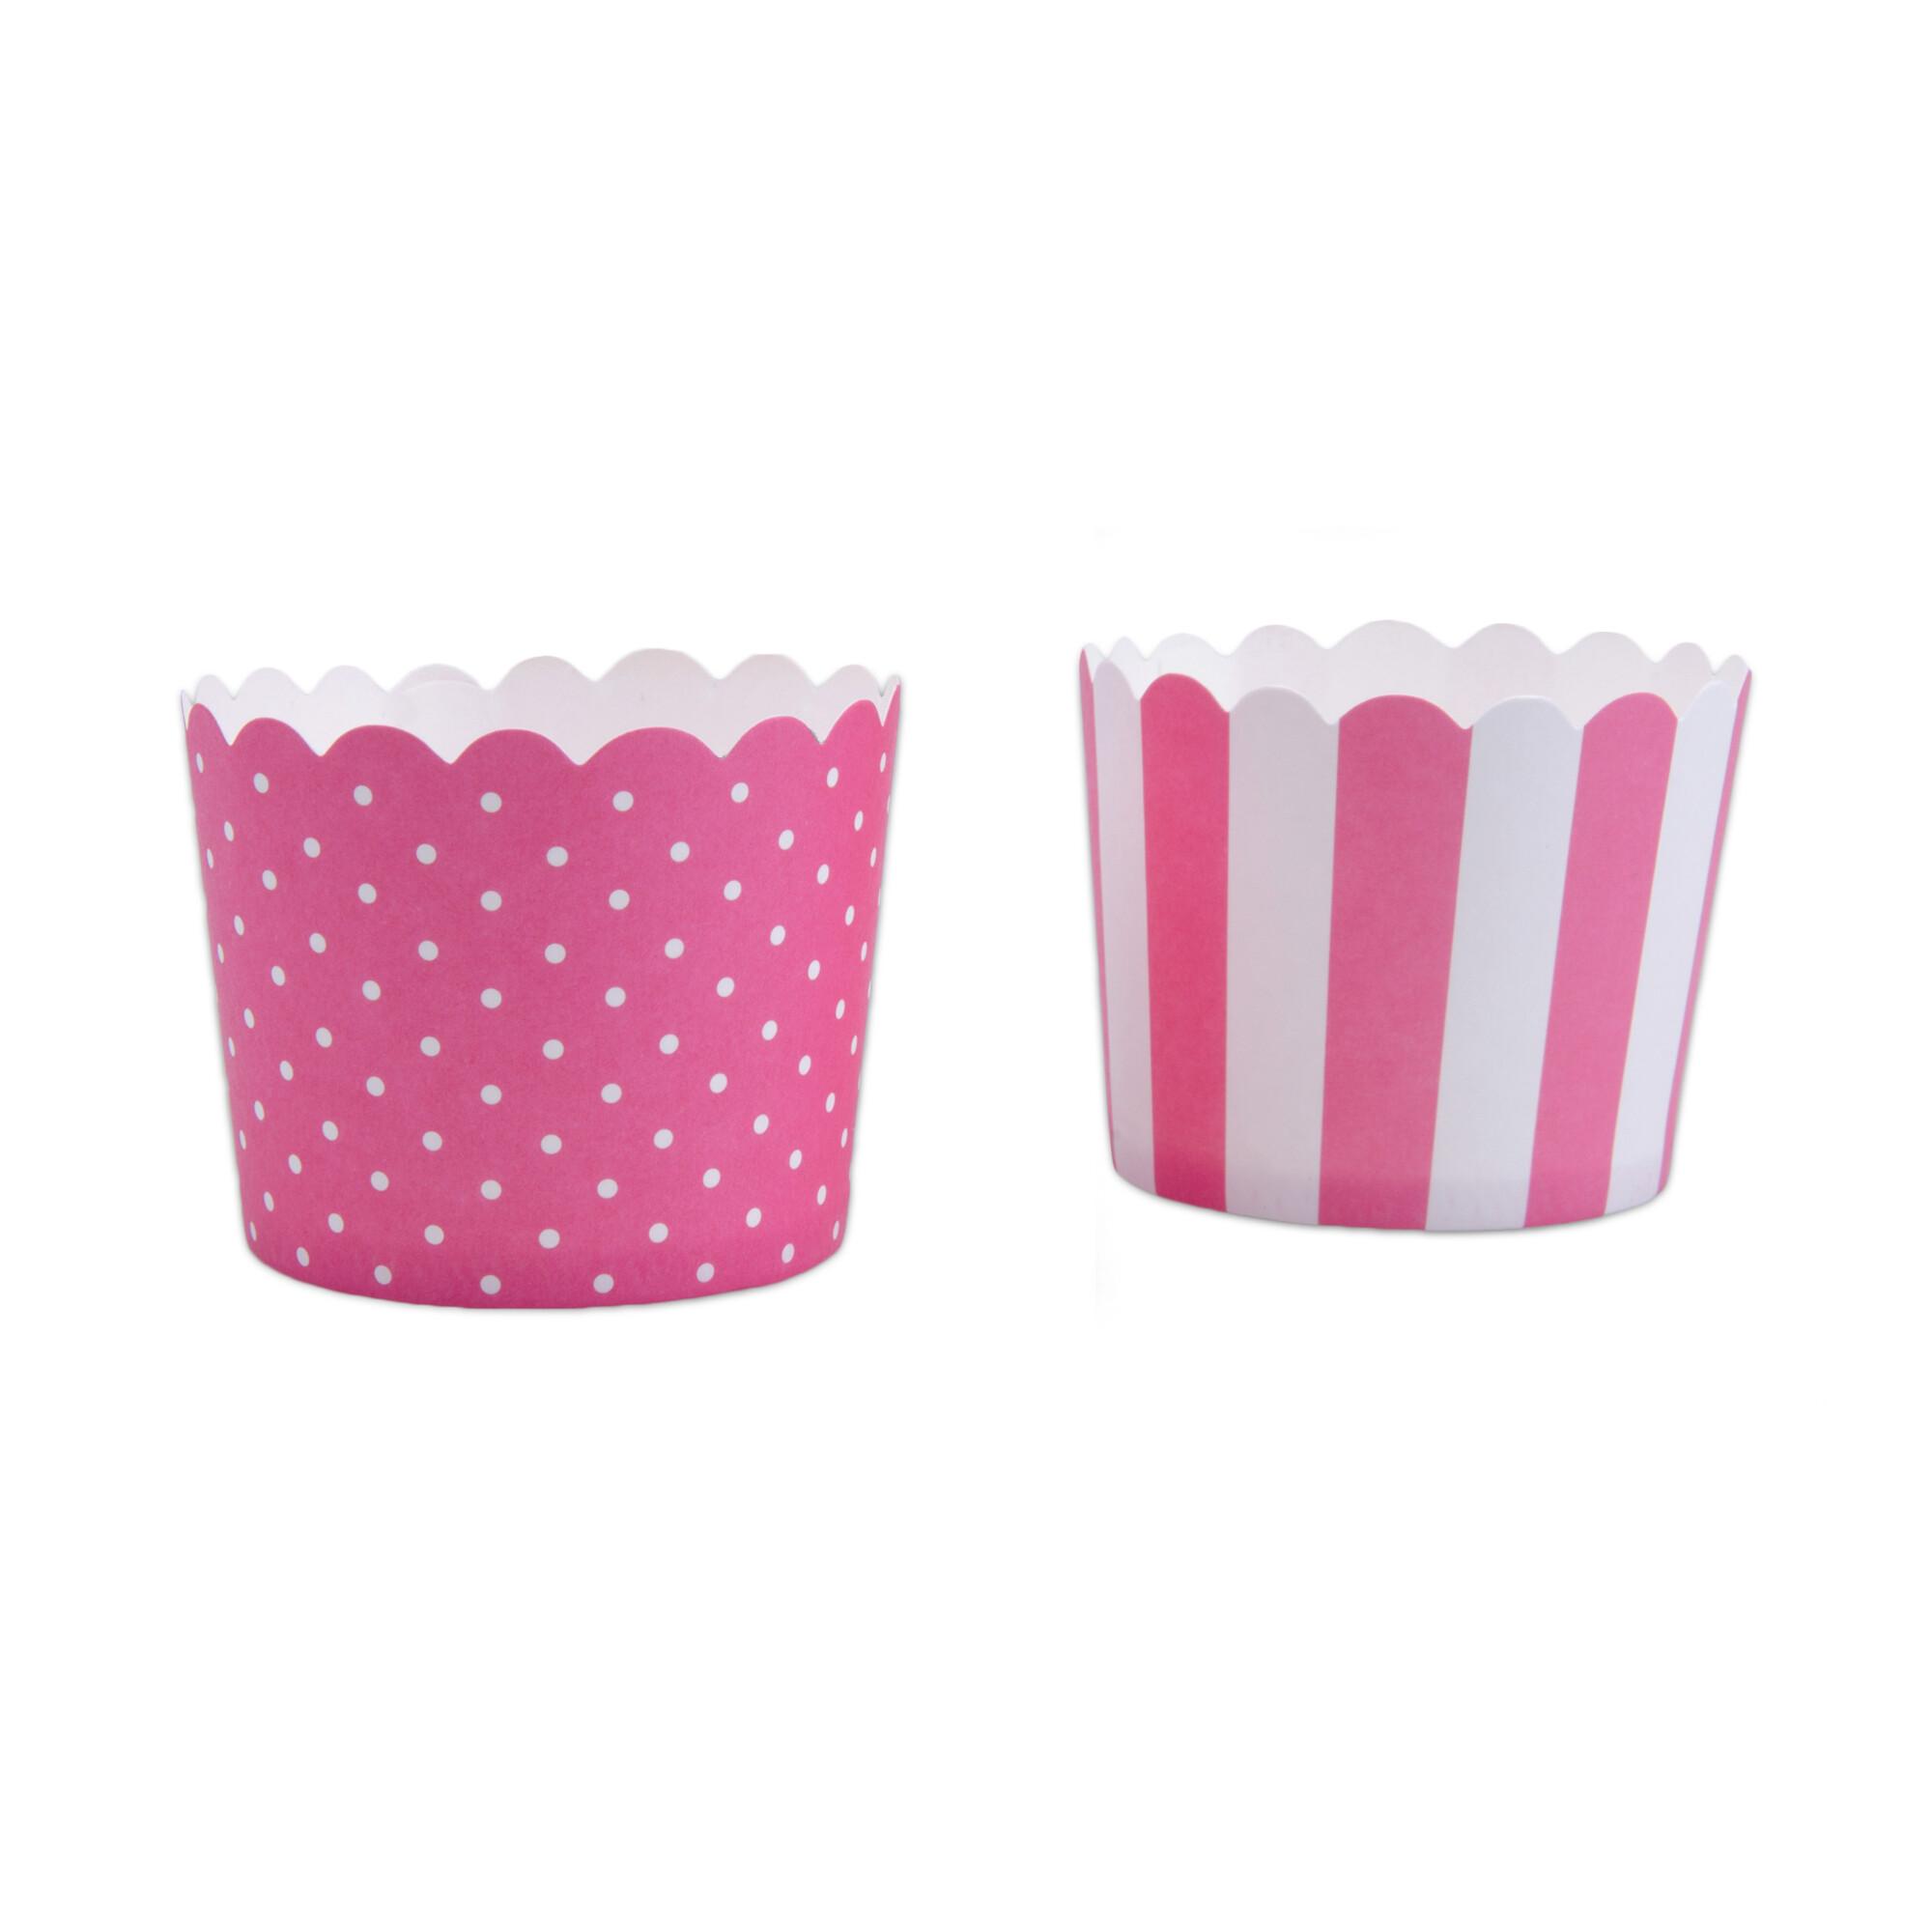 Cupcake liner - Pink white - Mini - 12 pieces